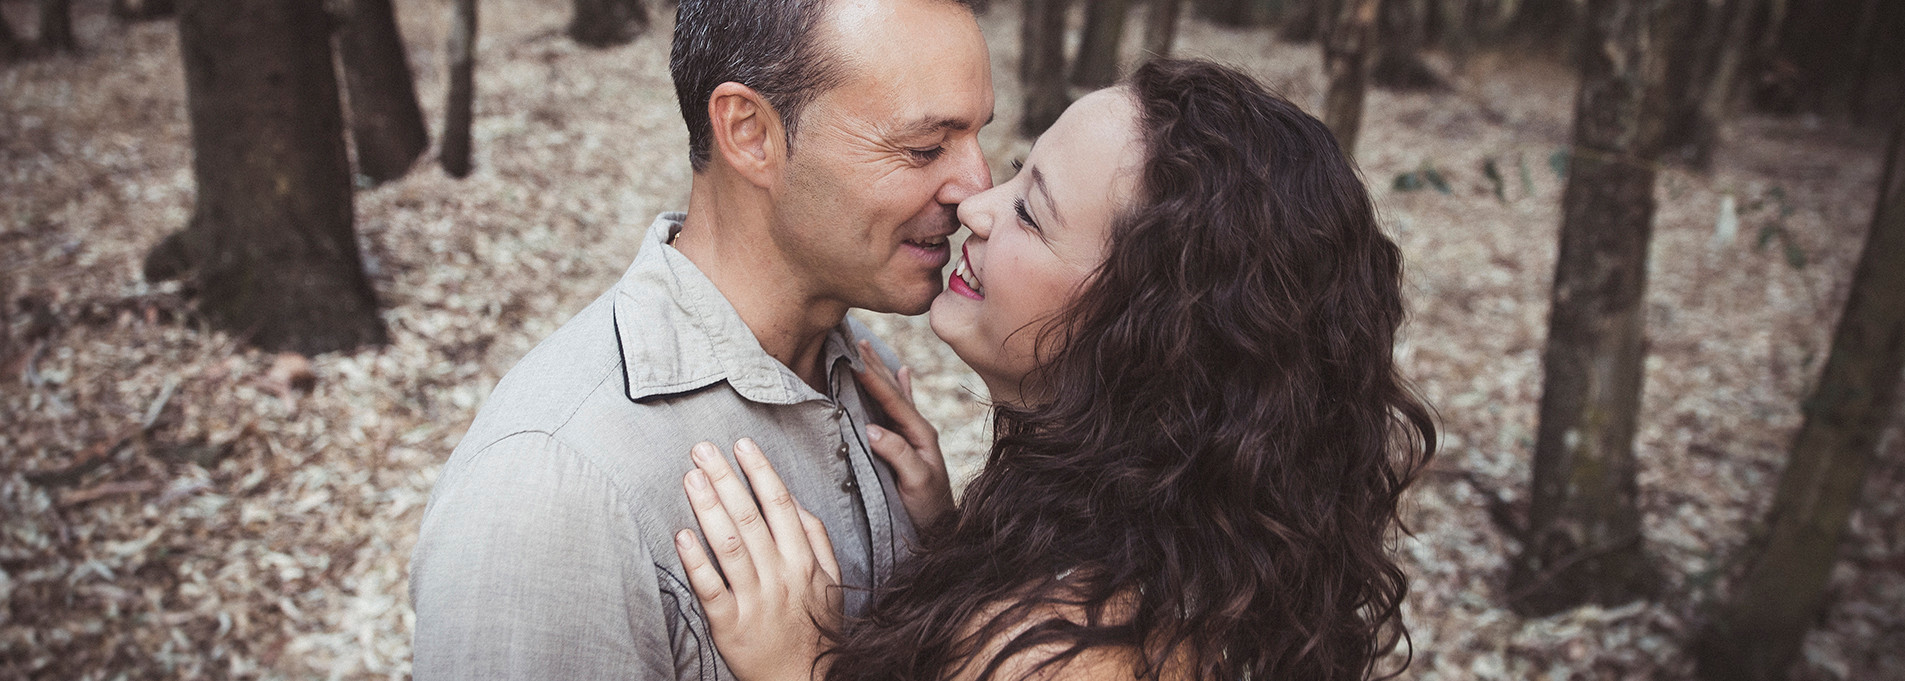 Fotografo bodas badajoz merida sevilla caceres Estrella Diaz Photovisual 39